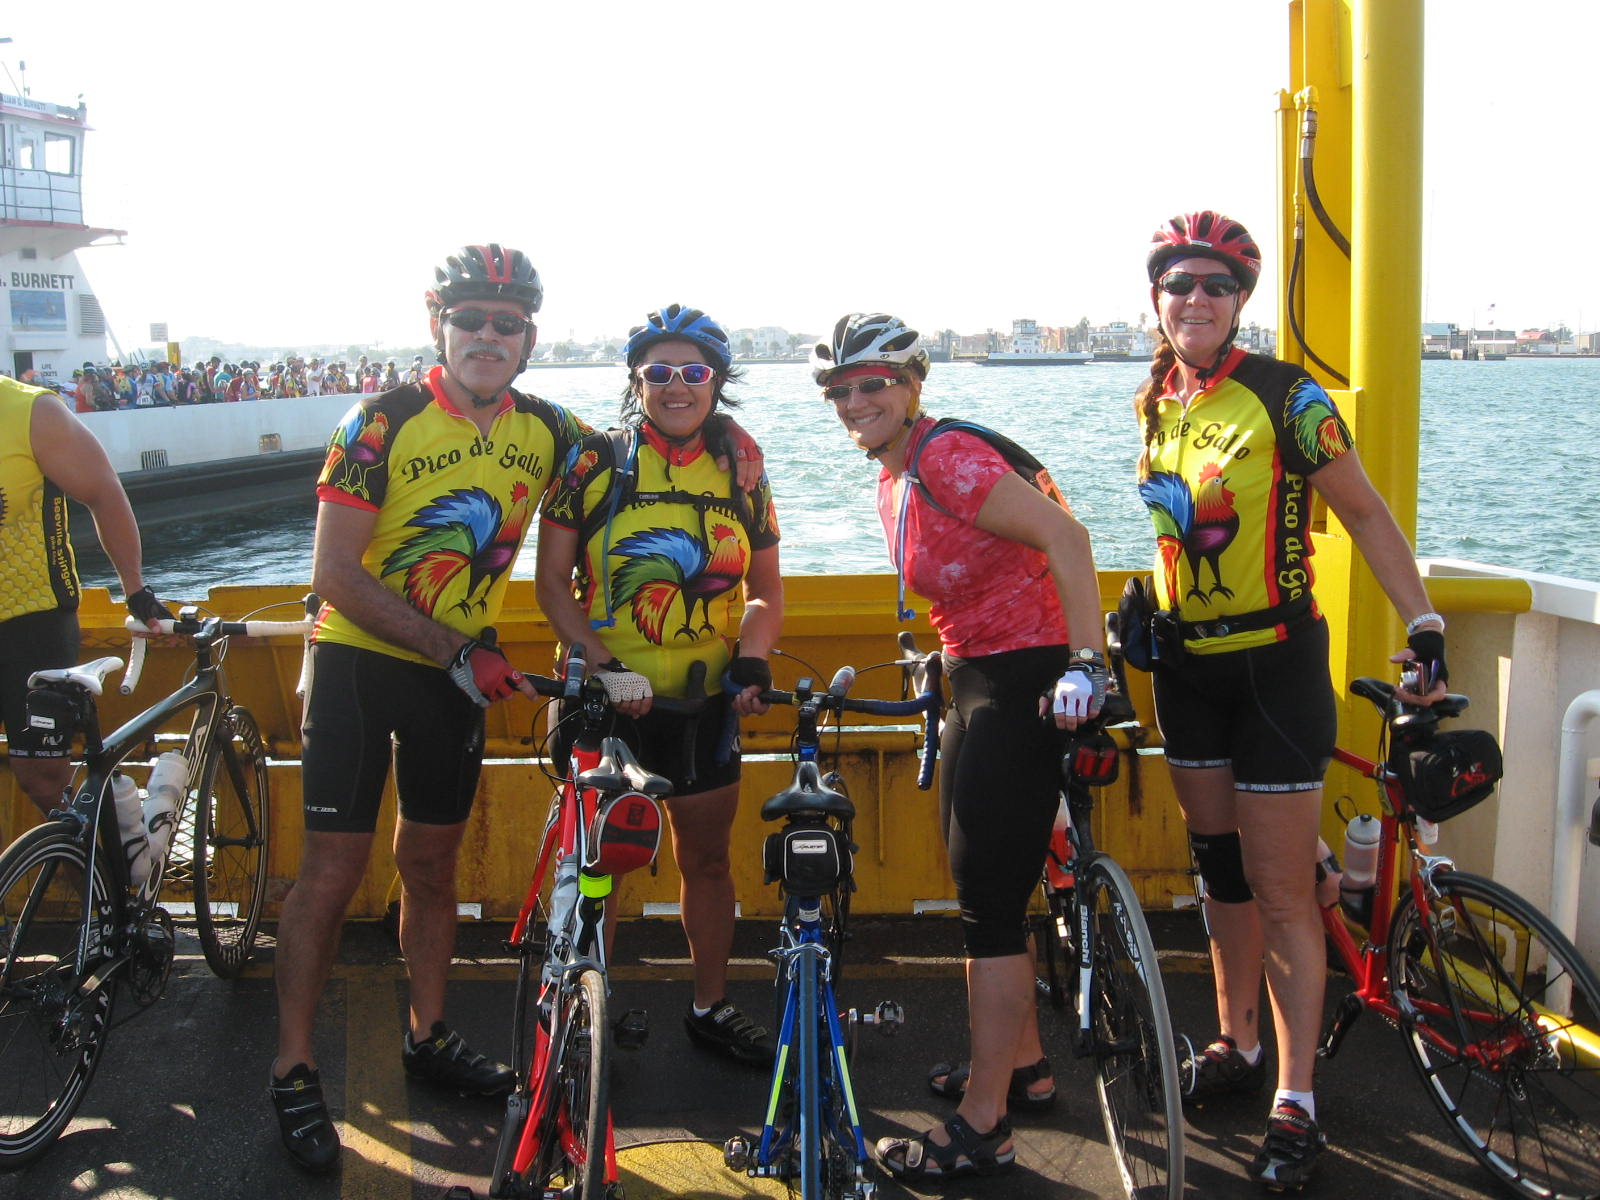 Conquer the Coast 2011 - Corpus Christi, Tx